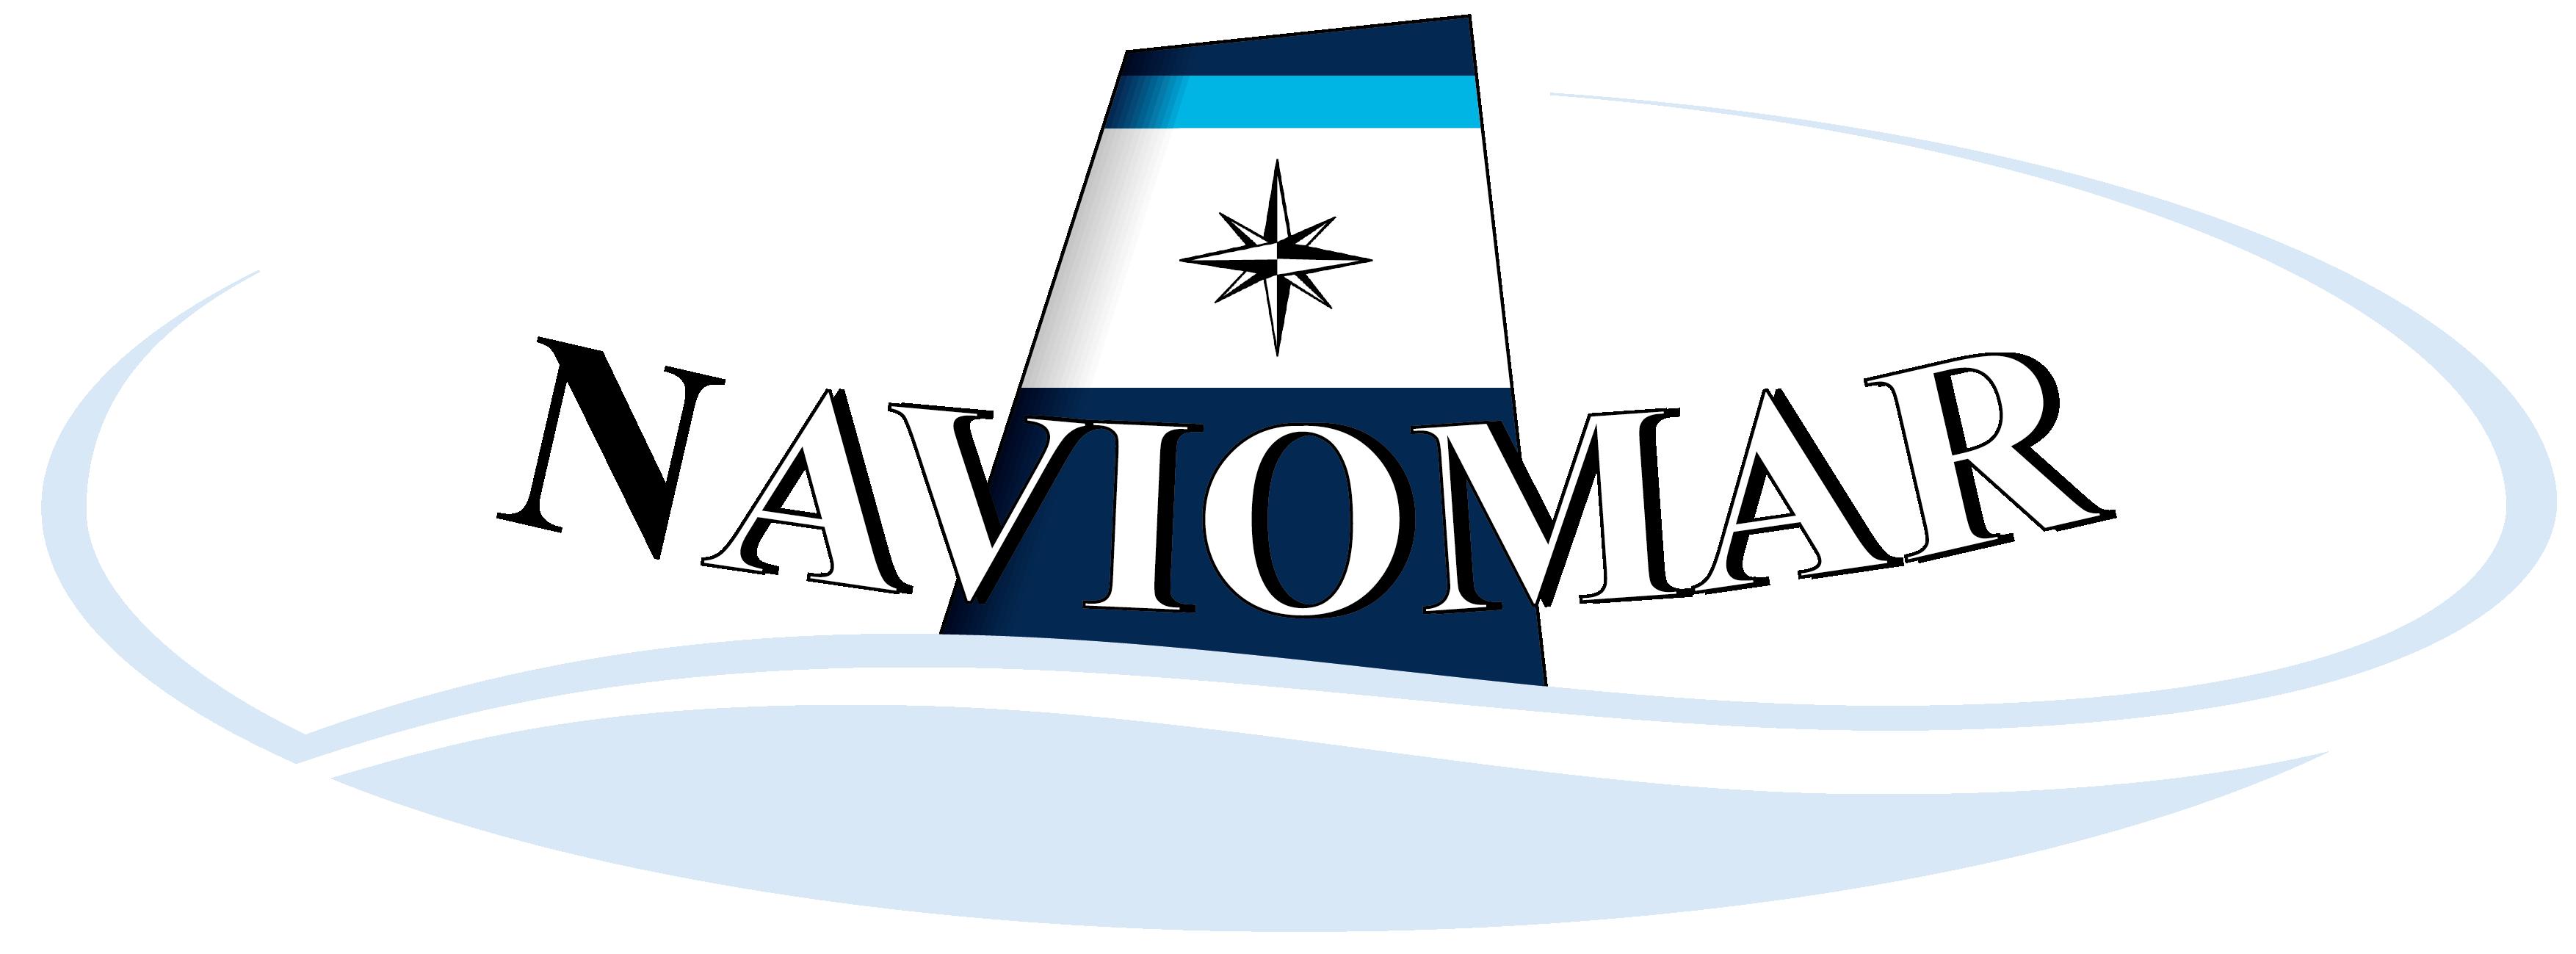 Naviomar-BCN_LOGO_adaptacio-sense-fons